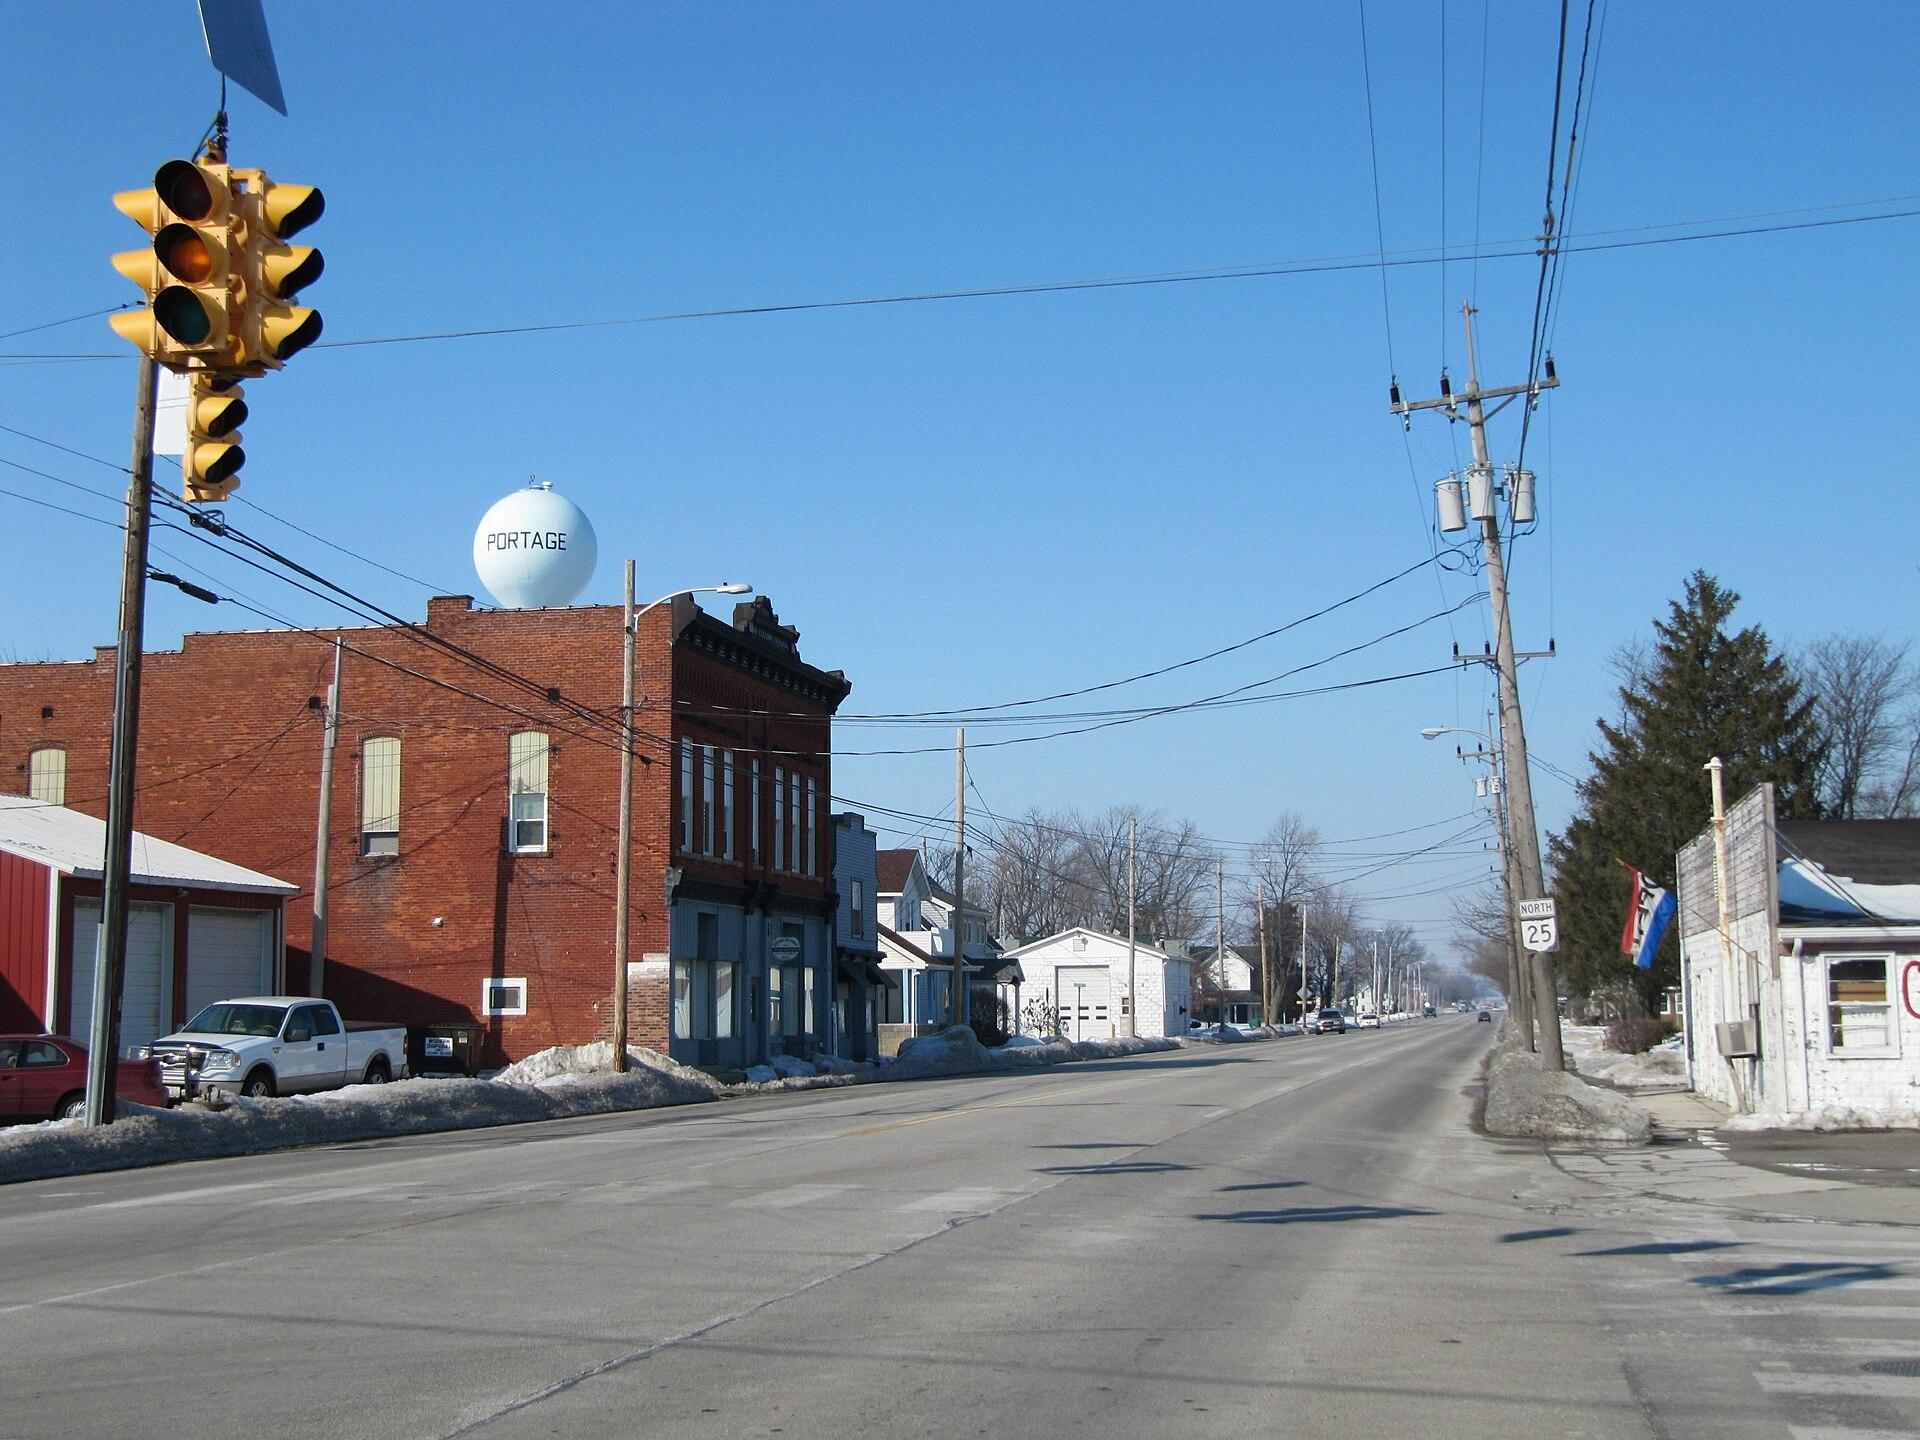 Portage, Ohio